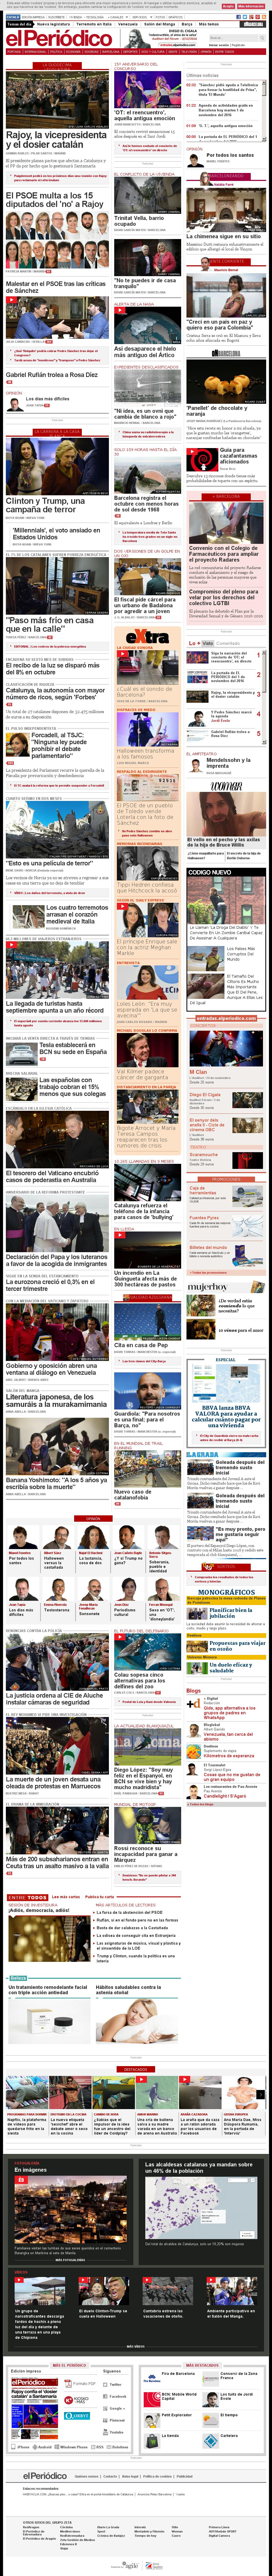 El Periodico at Tuesday Nov. 1, 2016, 2:15 a.m. UTC